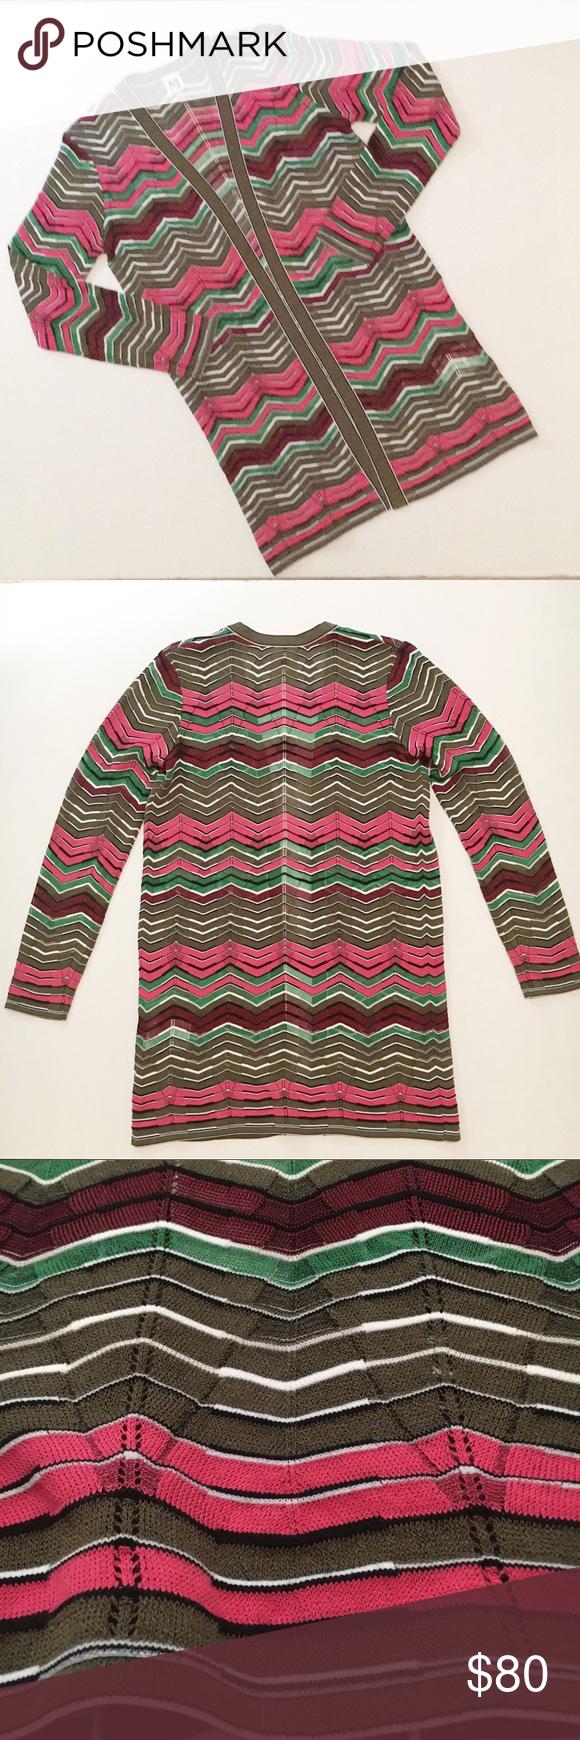 e0953fe09c NWOT M Missoni chevron cardigan sweater size M NWOT M by Missoni chevron  cardigan sweater, size 44 (M). Olive green, rose pink, burgundy, black, and  white.